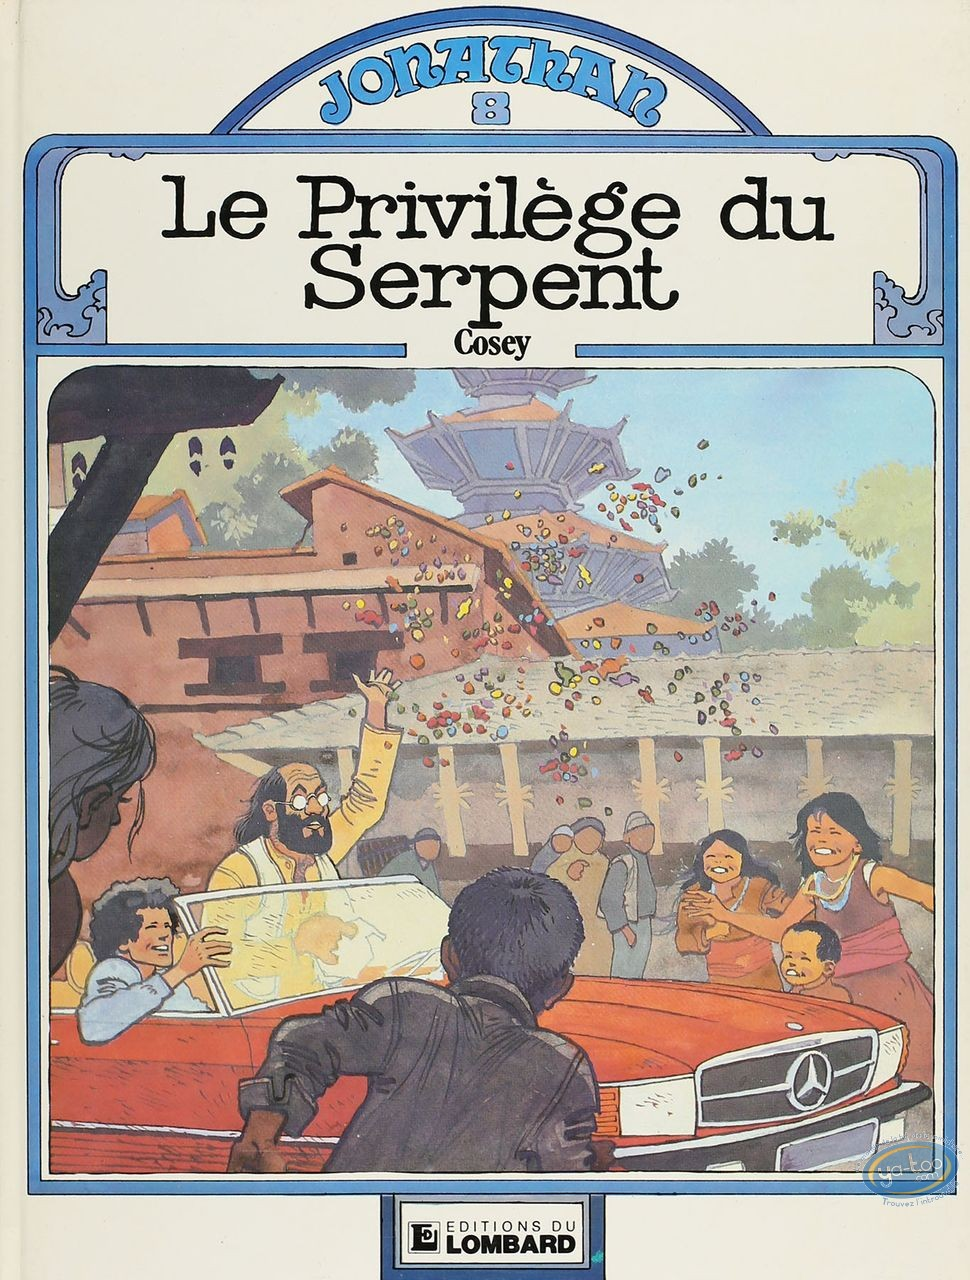 Listed European Comic Books, Jonathan : Le Privilege du Serpent